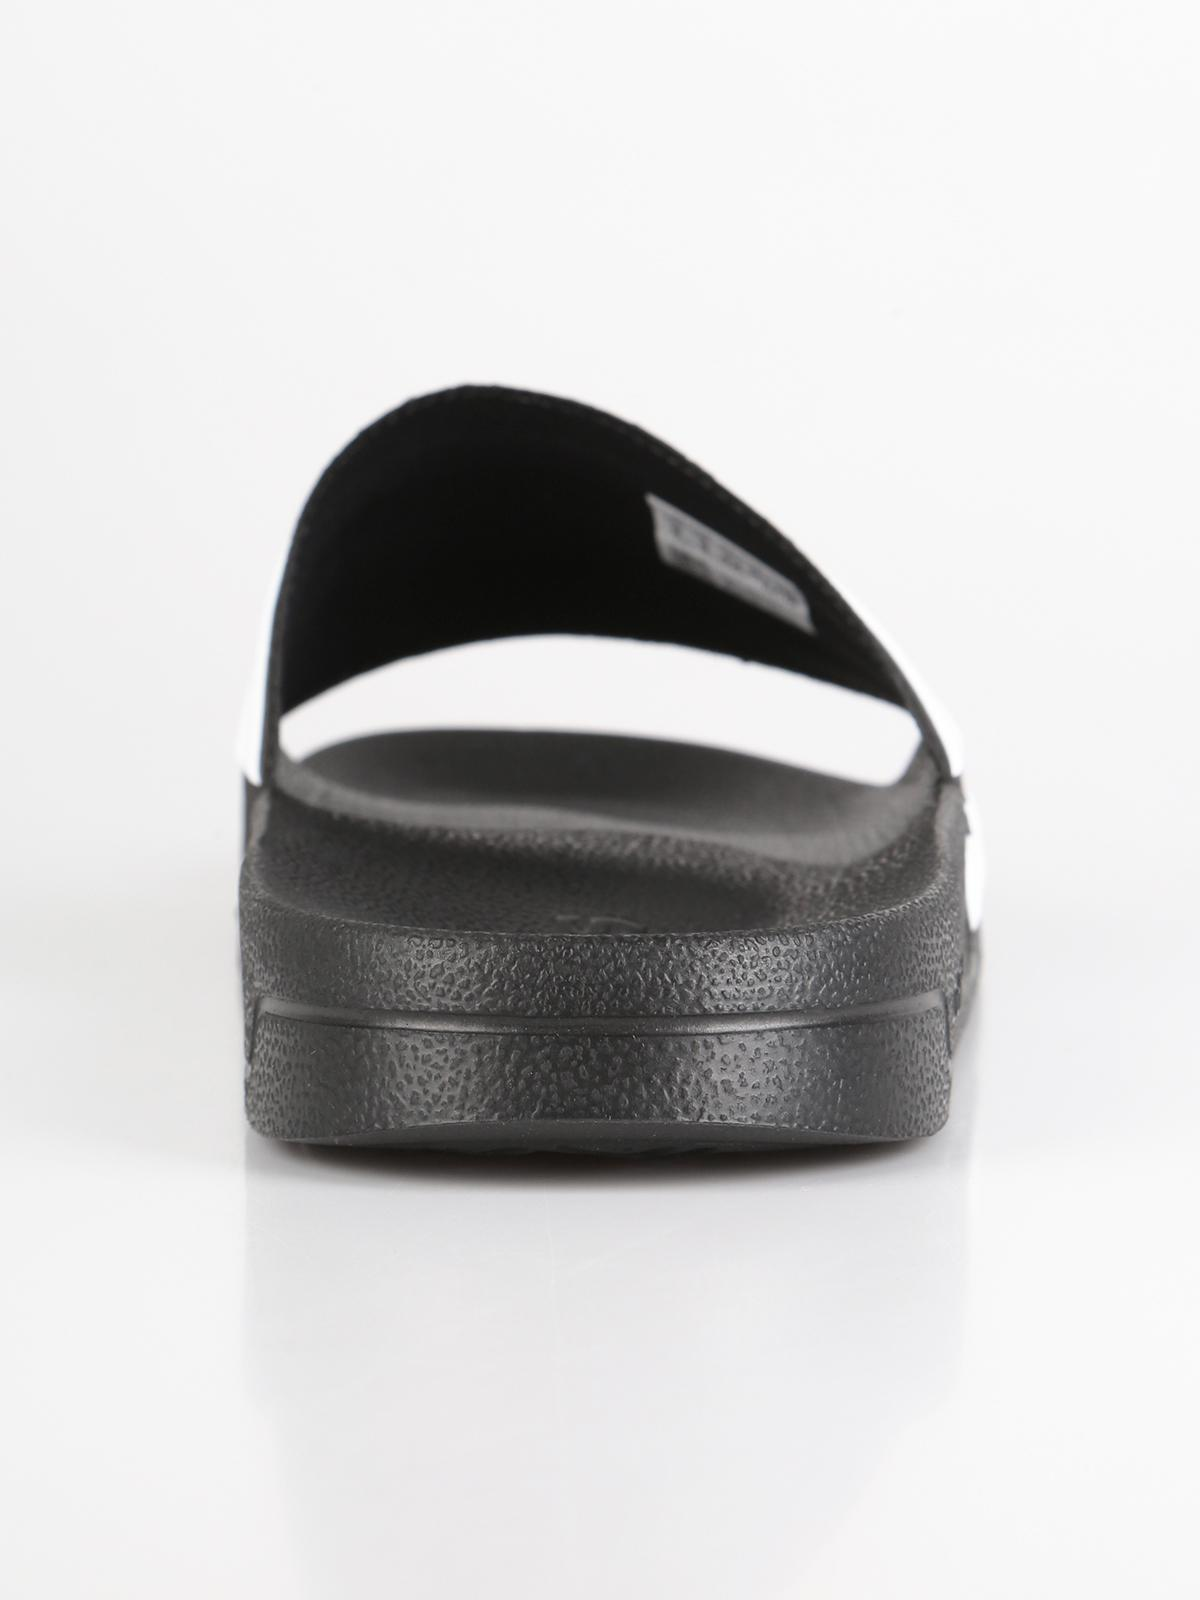 adidas ciabatte nere